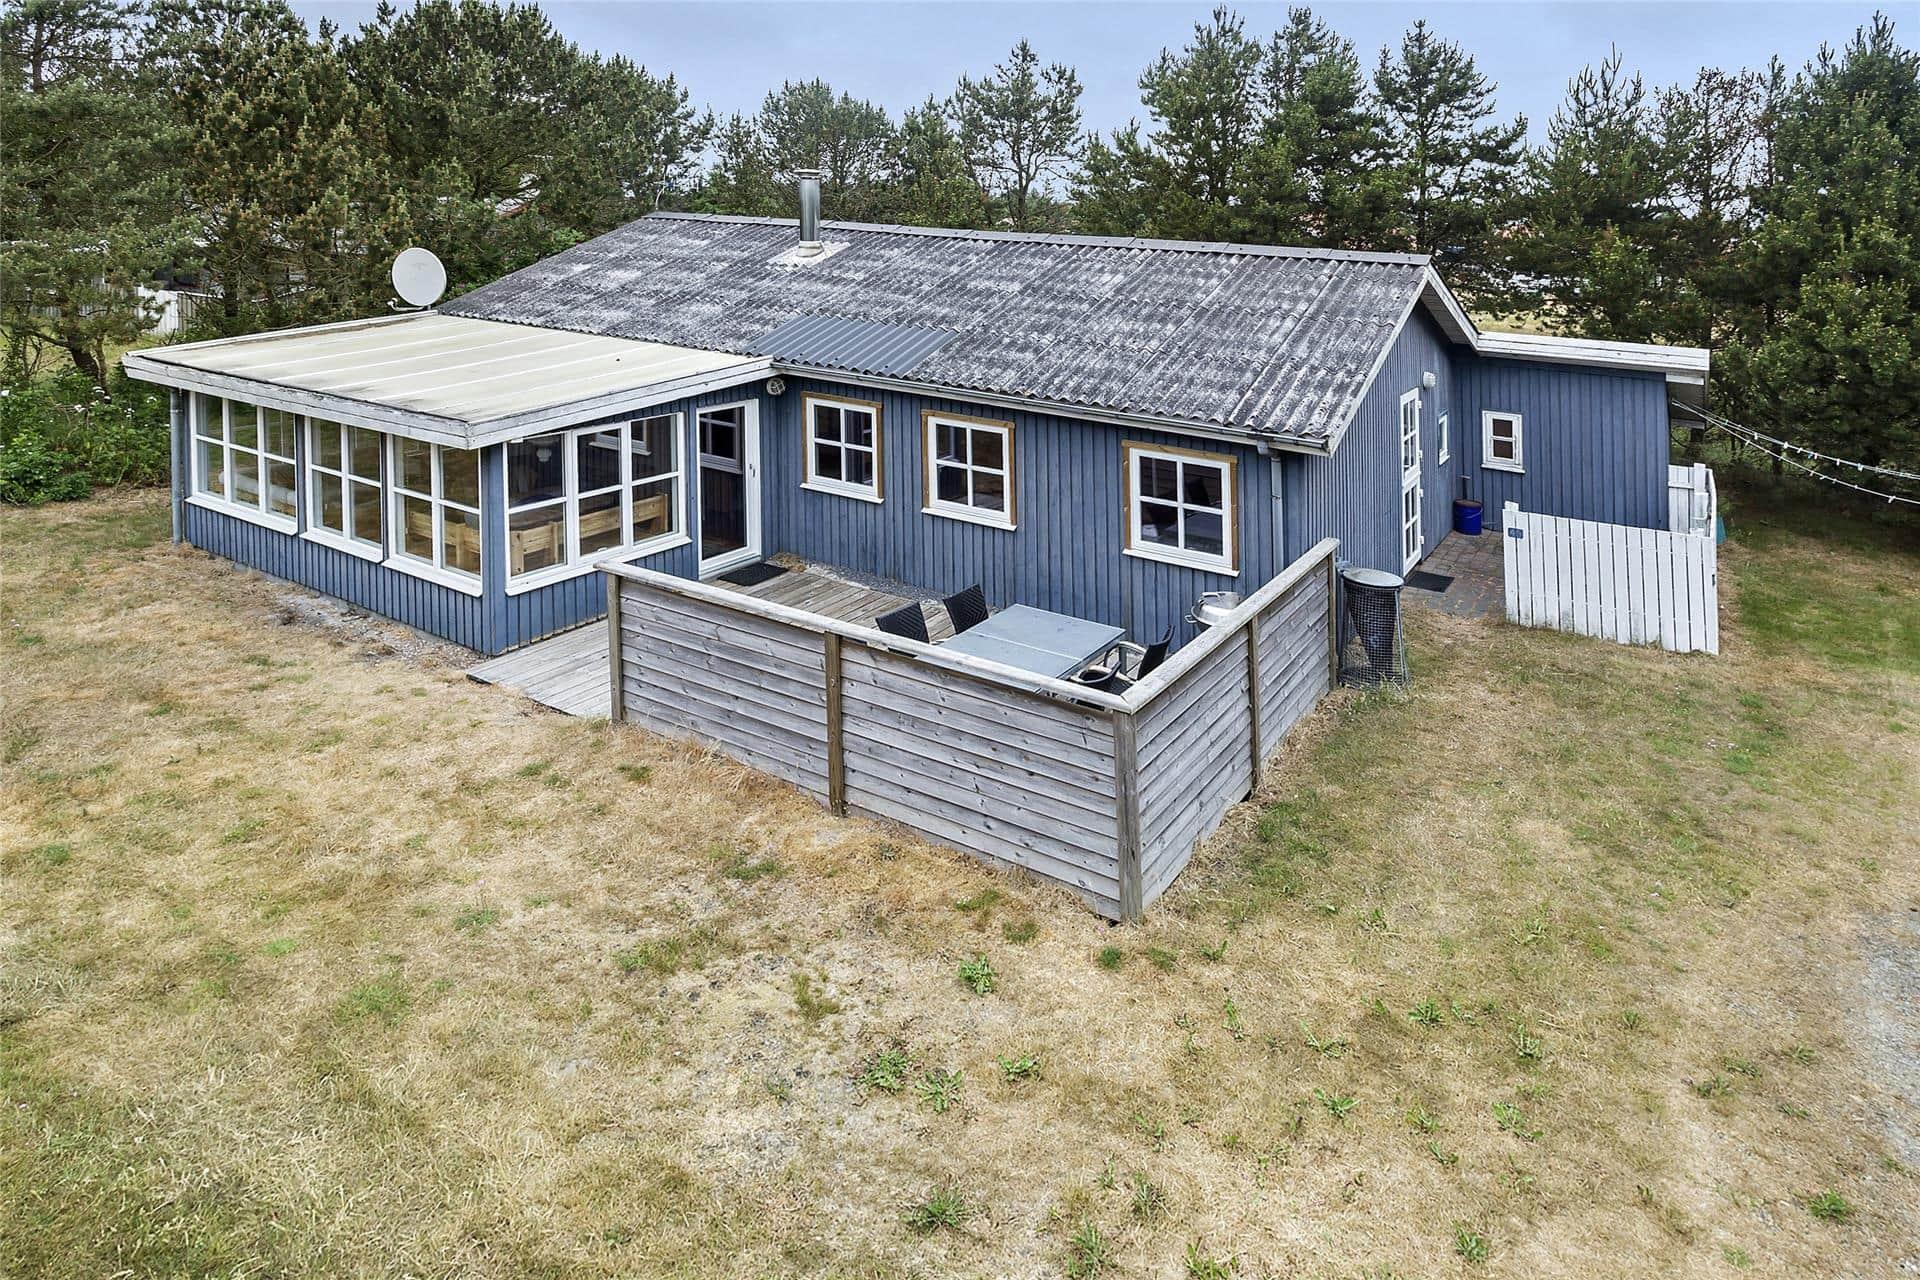 Image 1-13 Holiday-home 668, Klemsvej 45, DK - 7700 Thisted